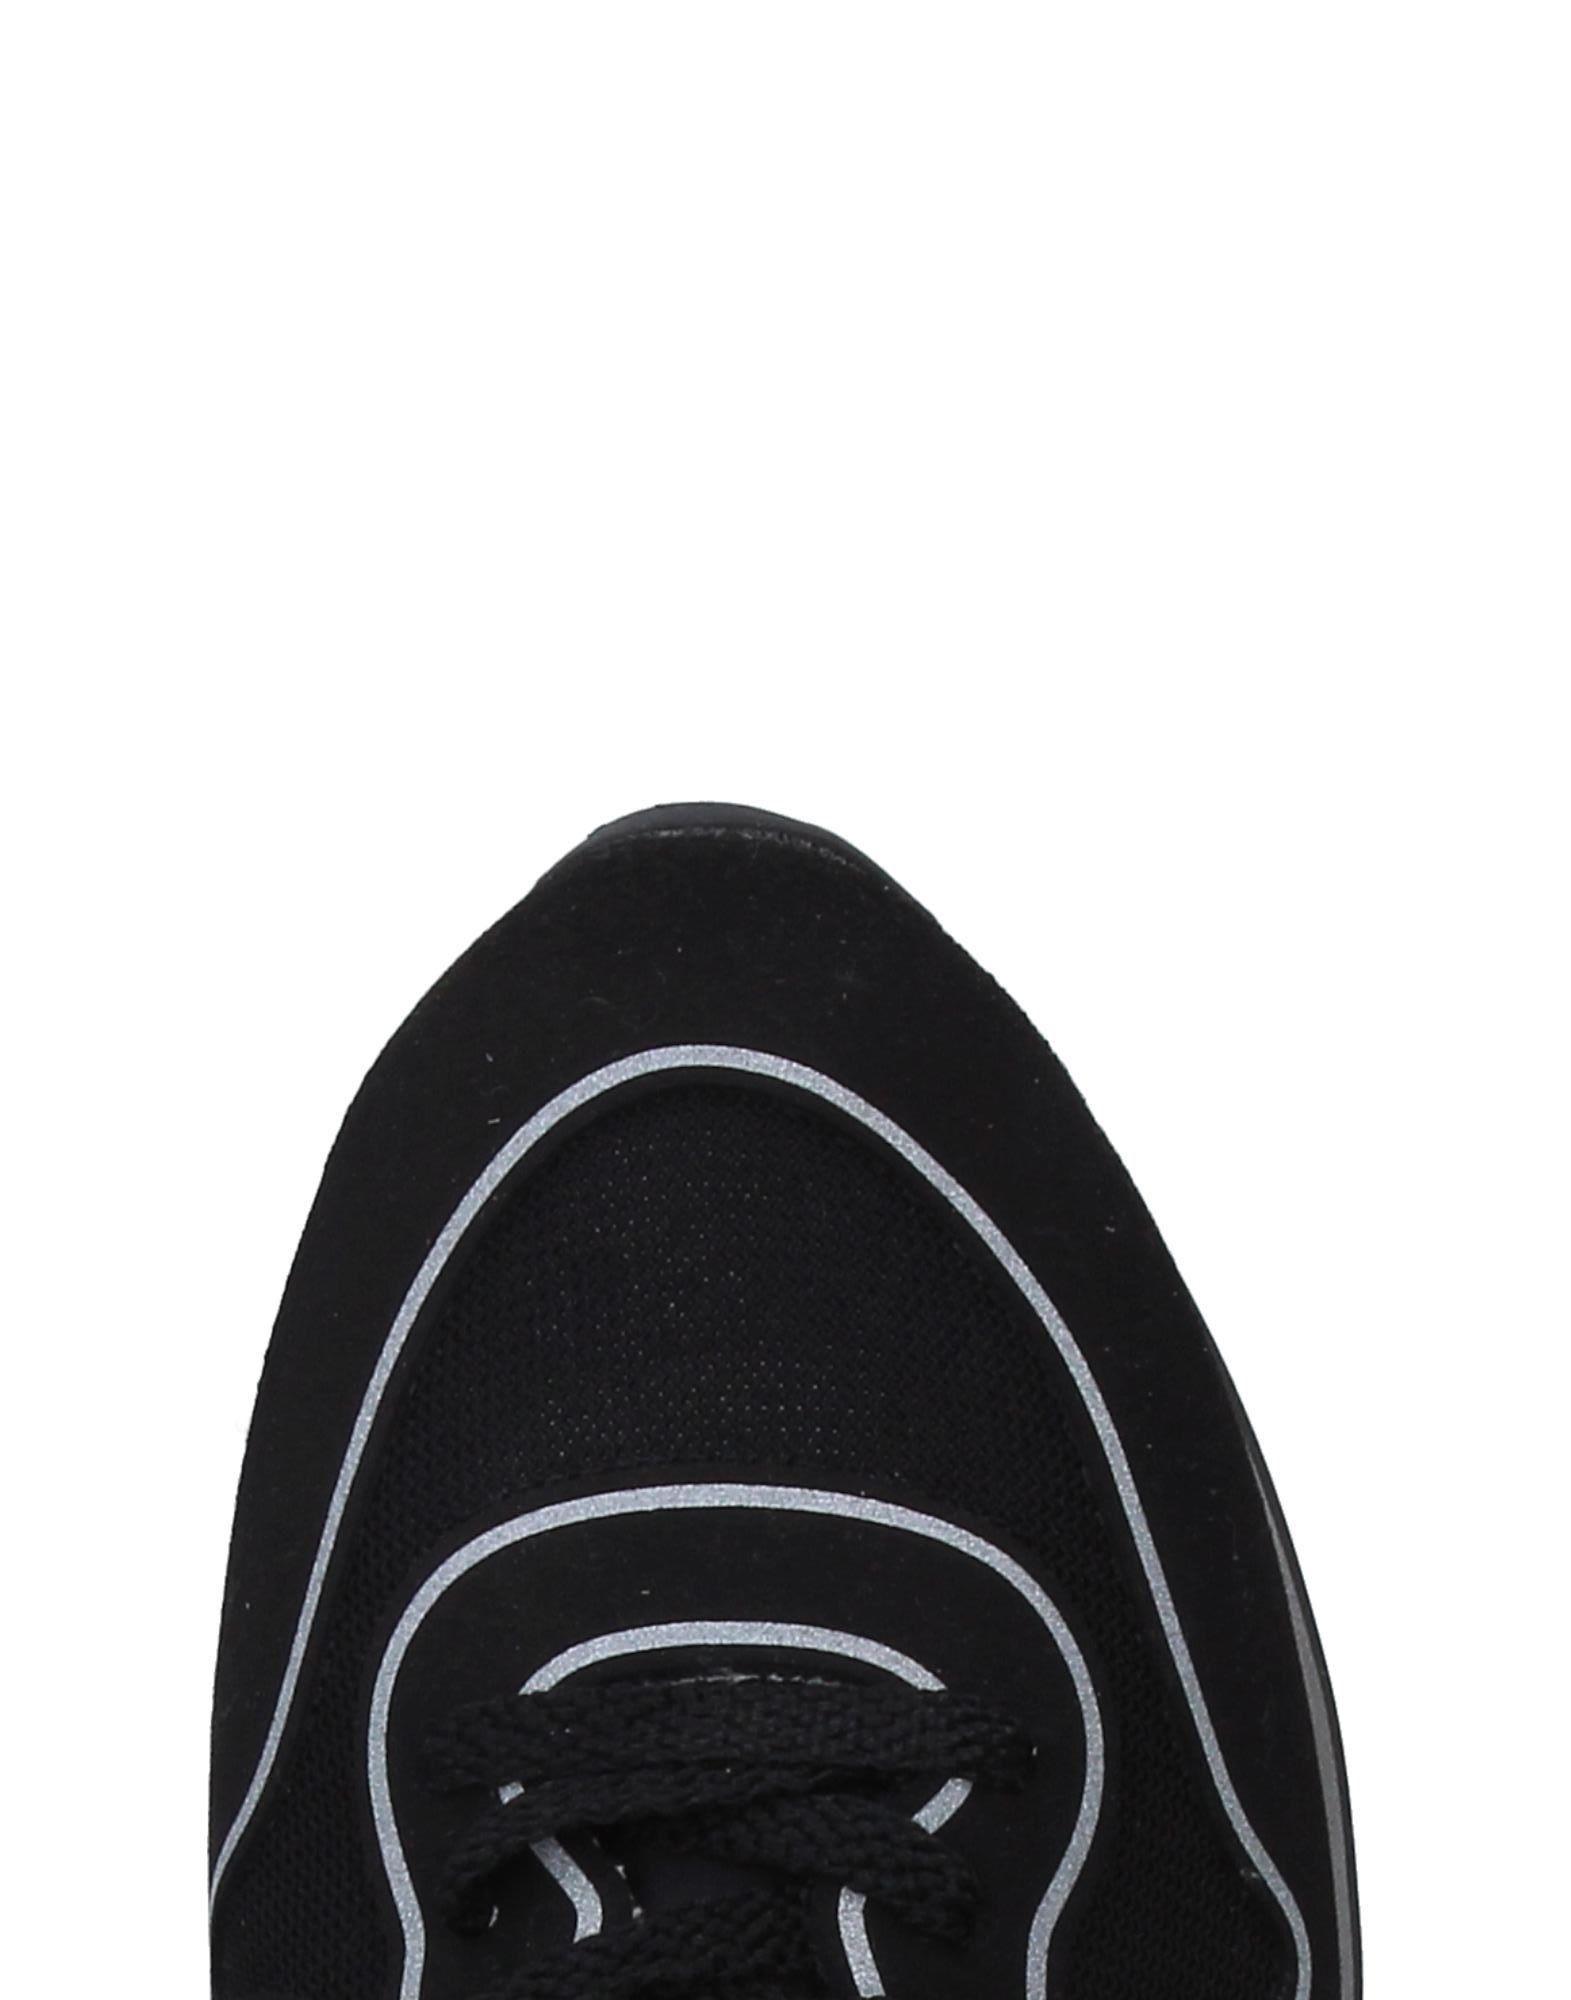 Golden Goose Deluxe Brand Sneakers strapazierfähige Damen  11270322WDGut aussehende strapazierfähige Sneakers Schuhe 63dec2